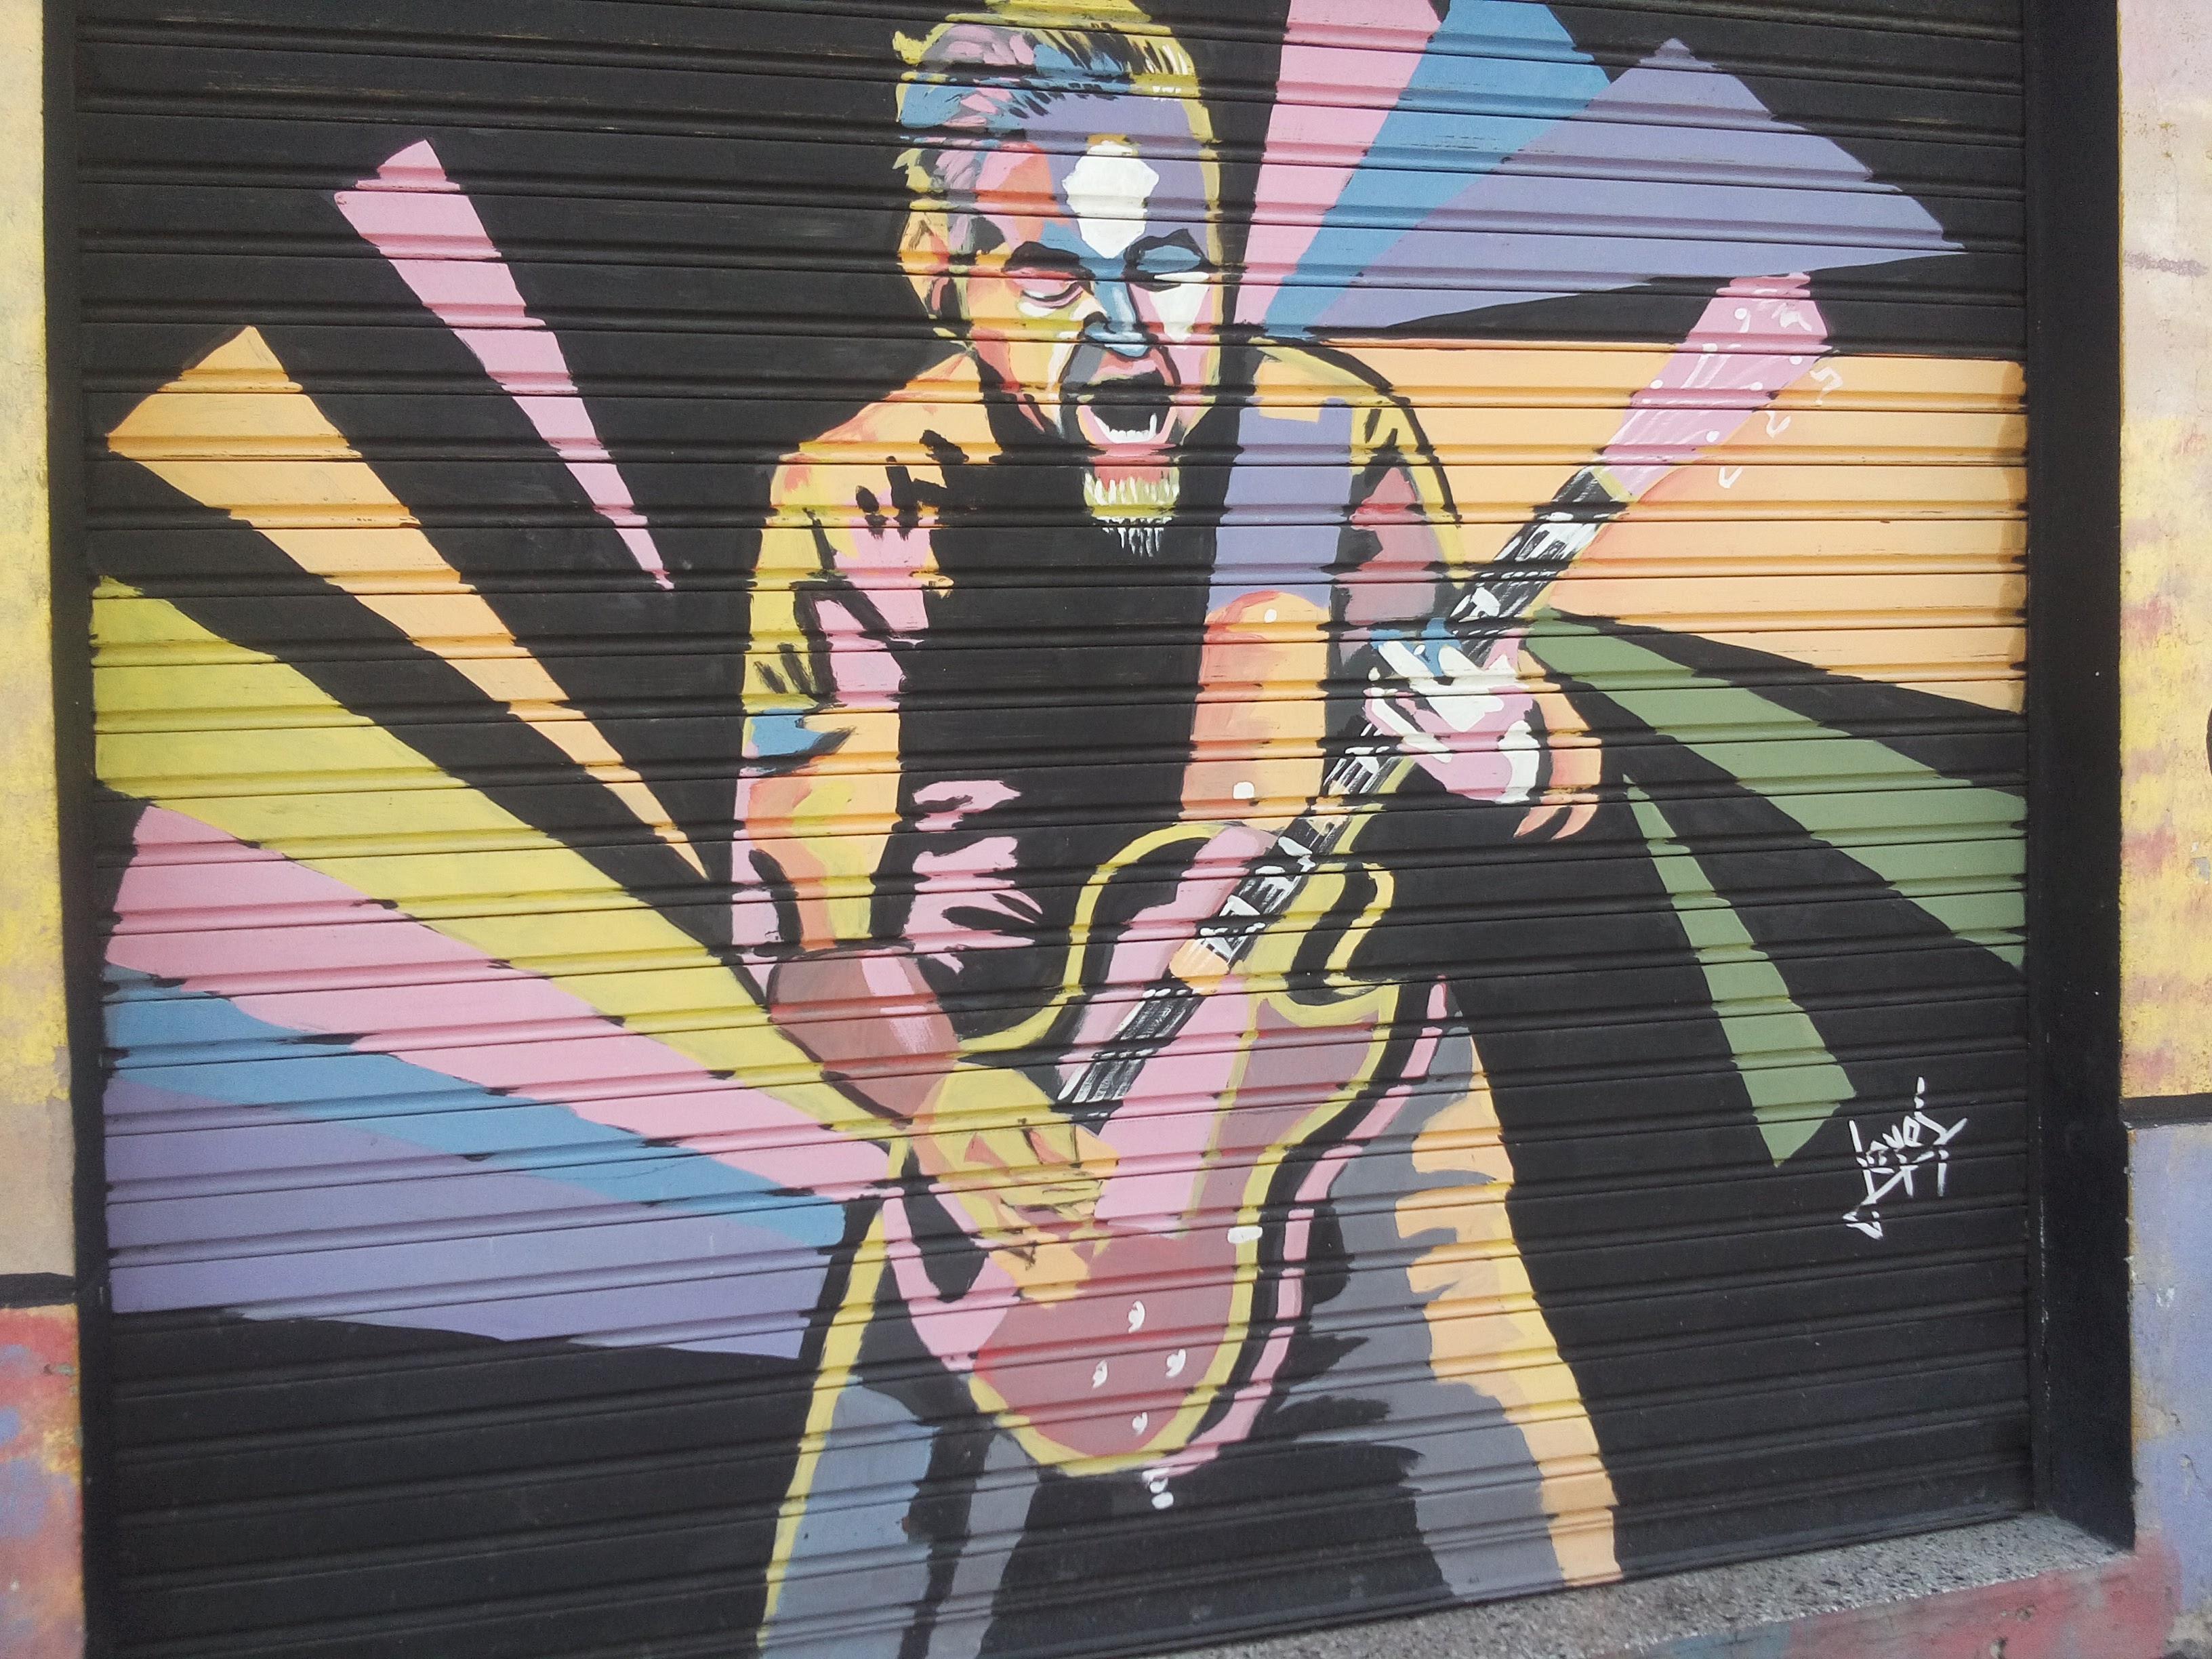 Bar La Fondita 2 - Mural en el Bar La Fondita